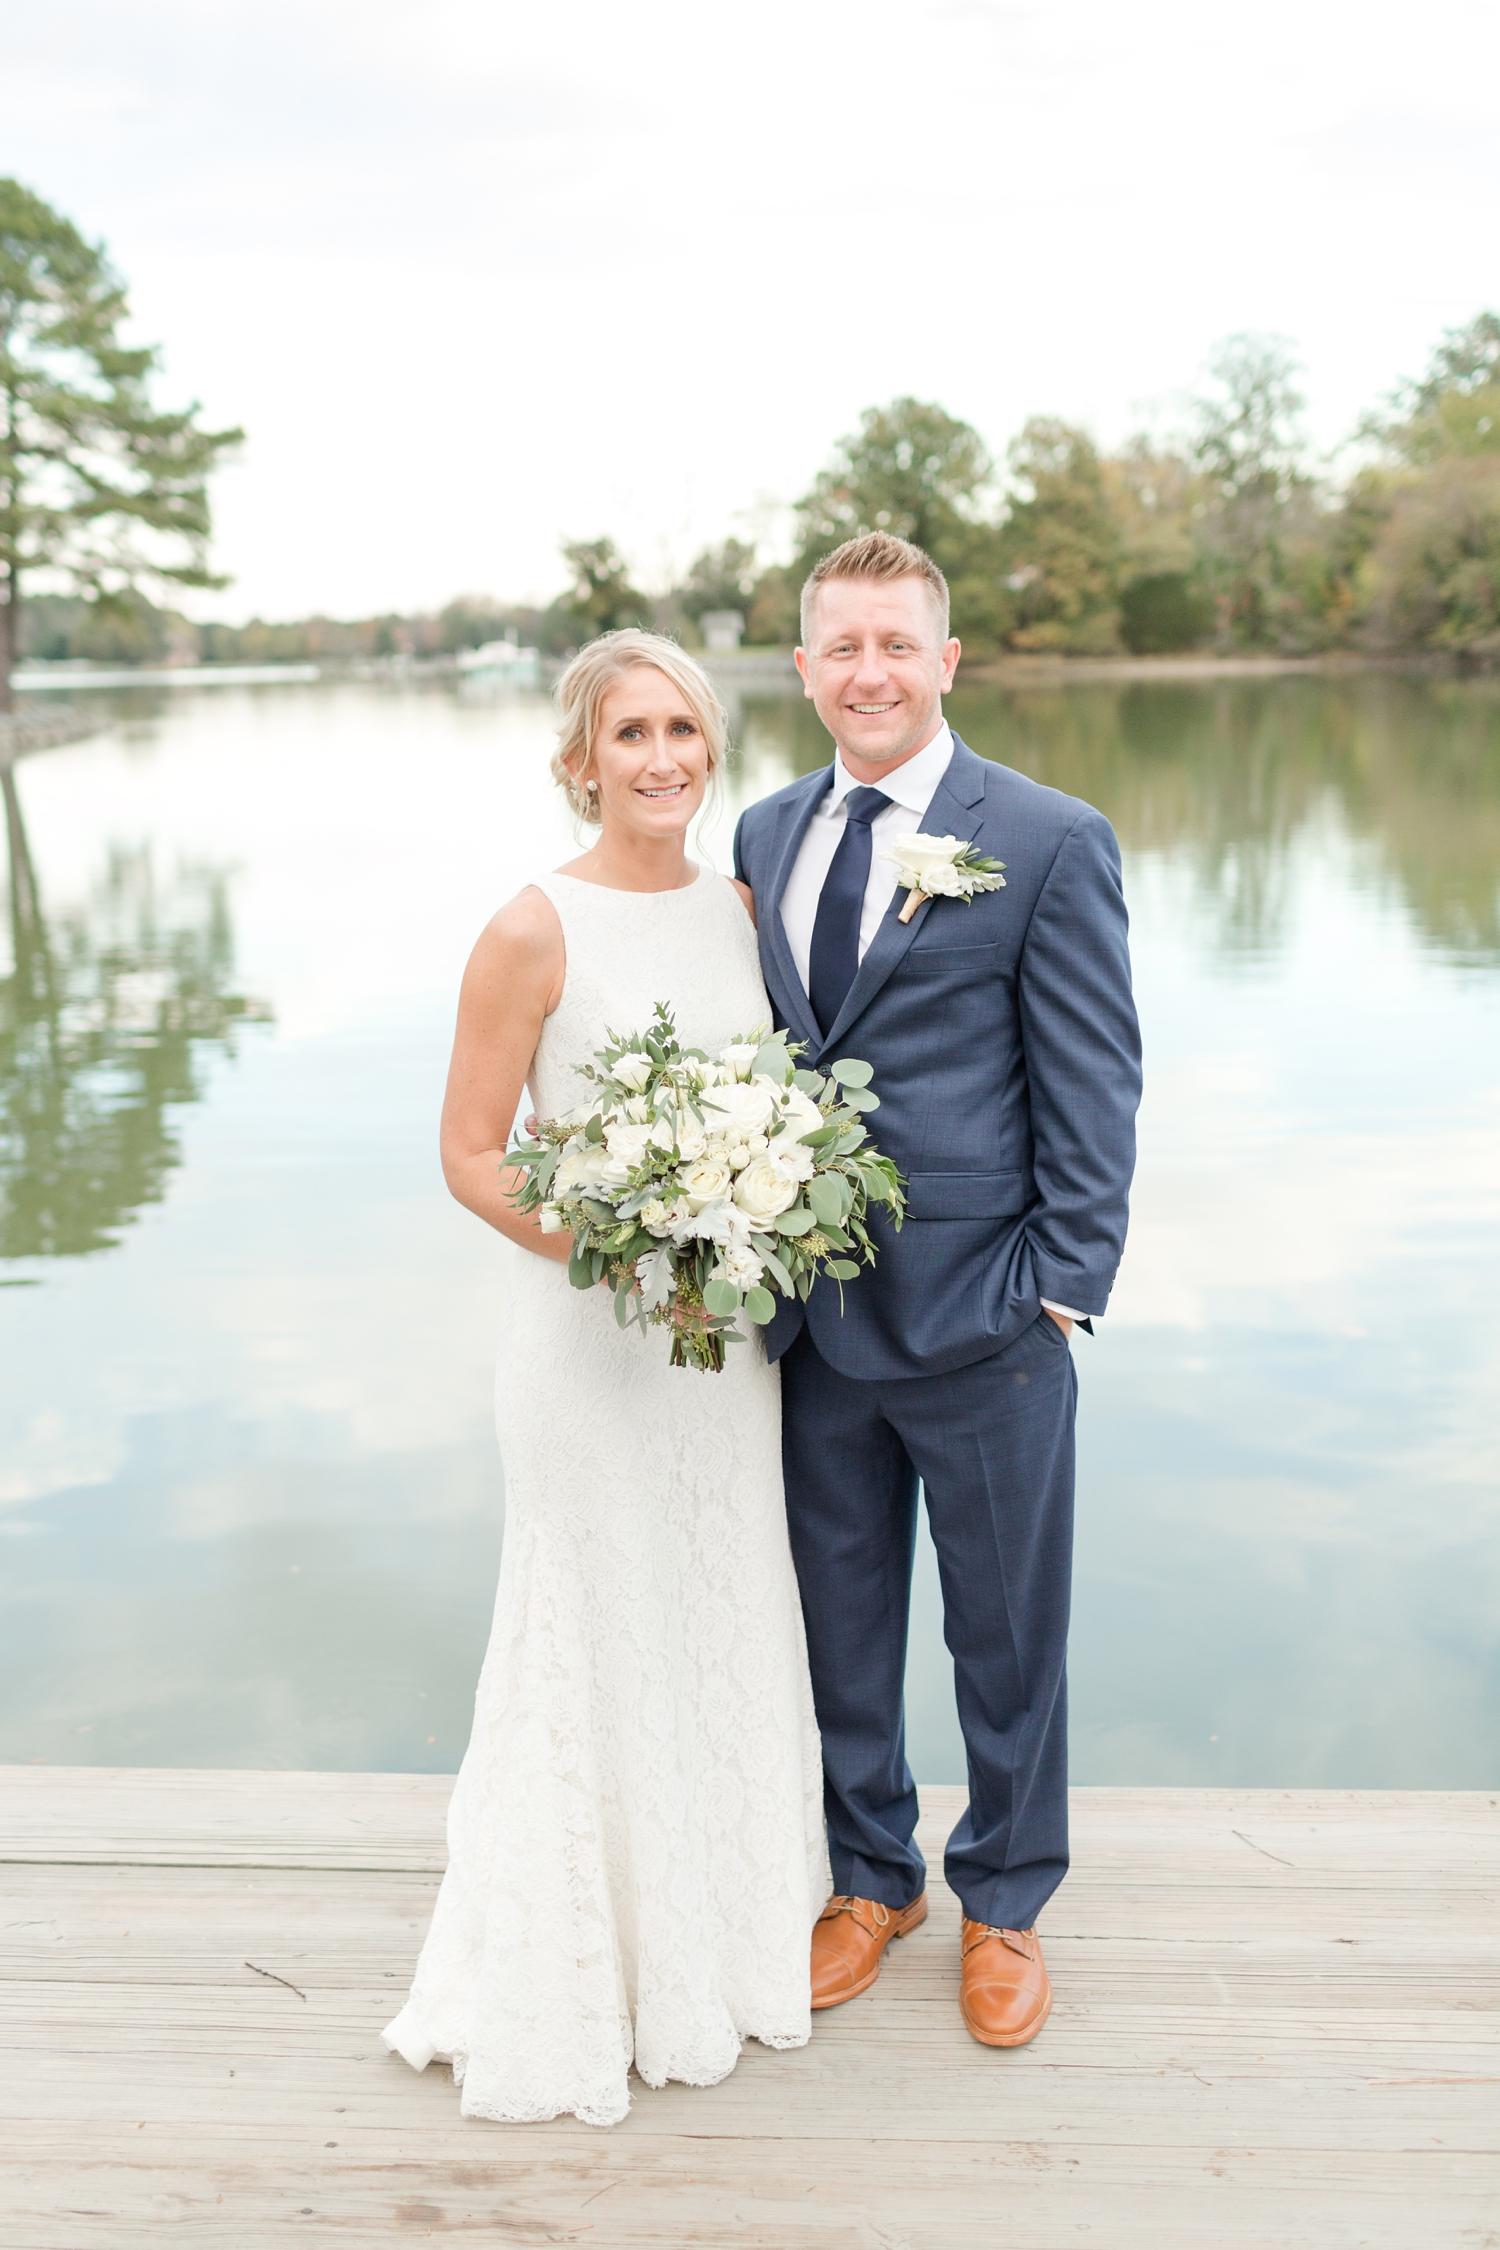 Wojciechowski Wedding-414_the-oaks-waterfront-inn-wedding-easton-maryland-wedding-photography-anna-grace-photography-photo.jpg